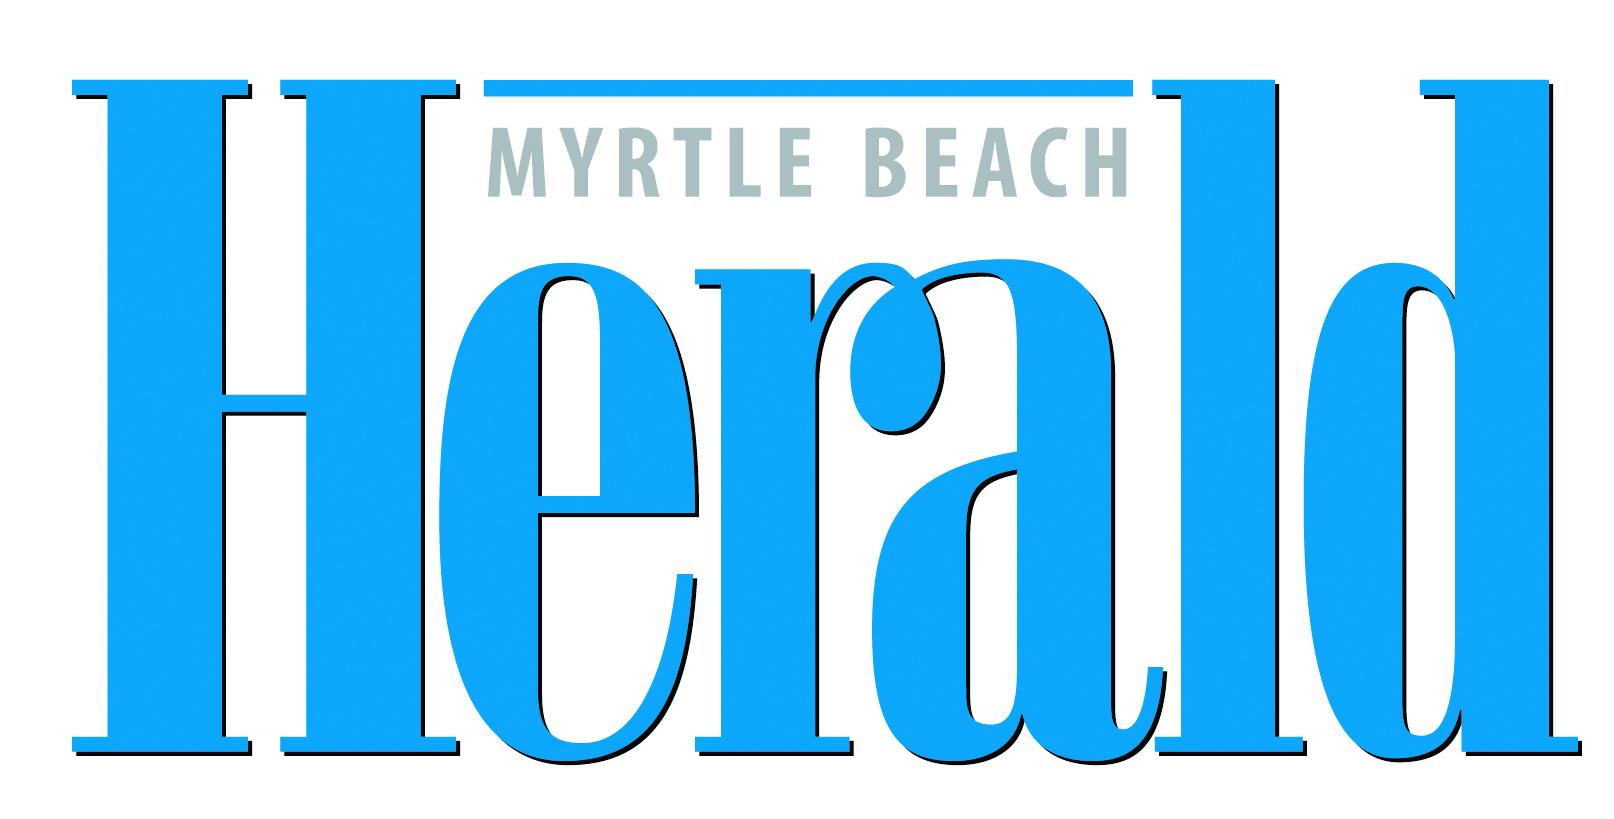 External Opportunities In Myrtle Beach